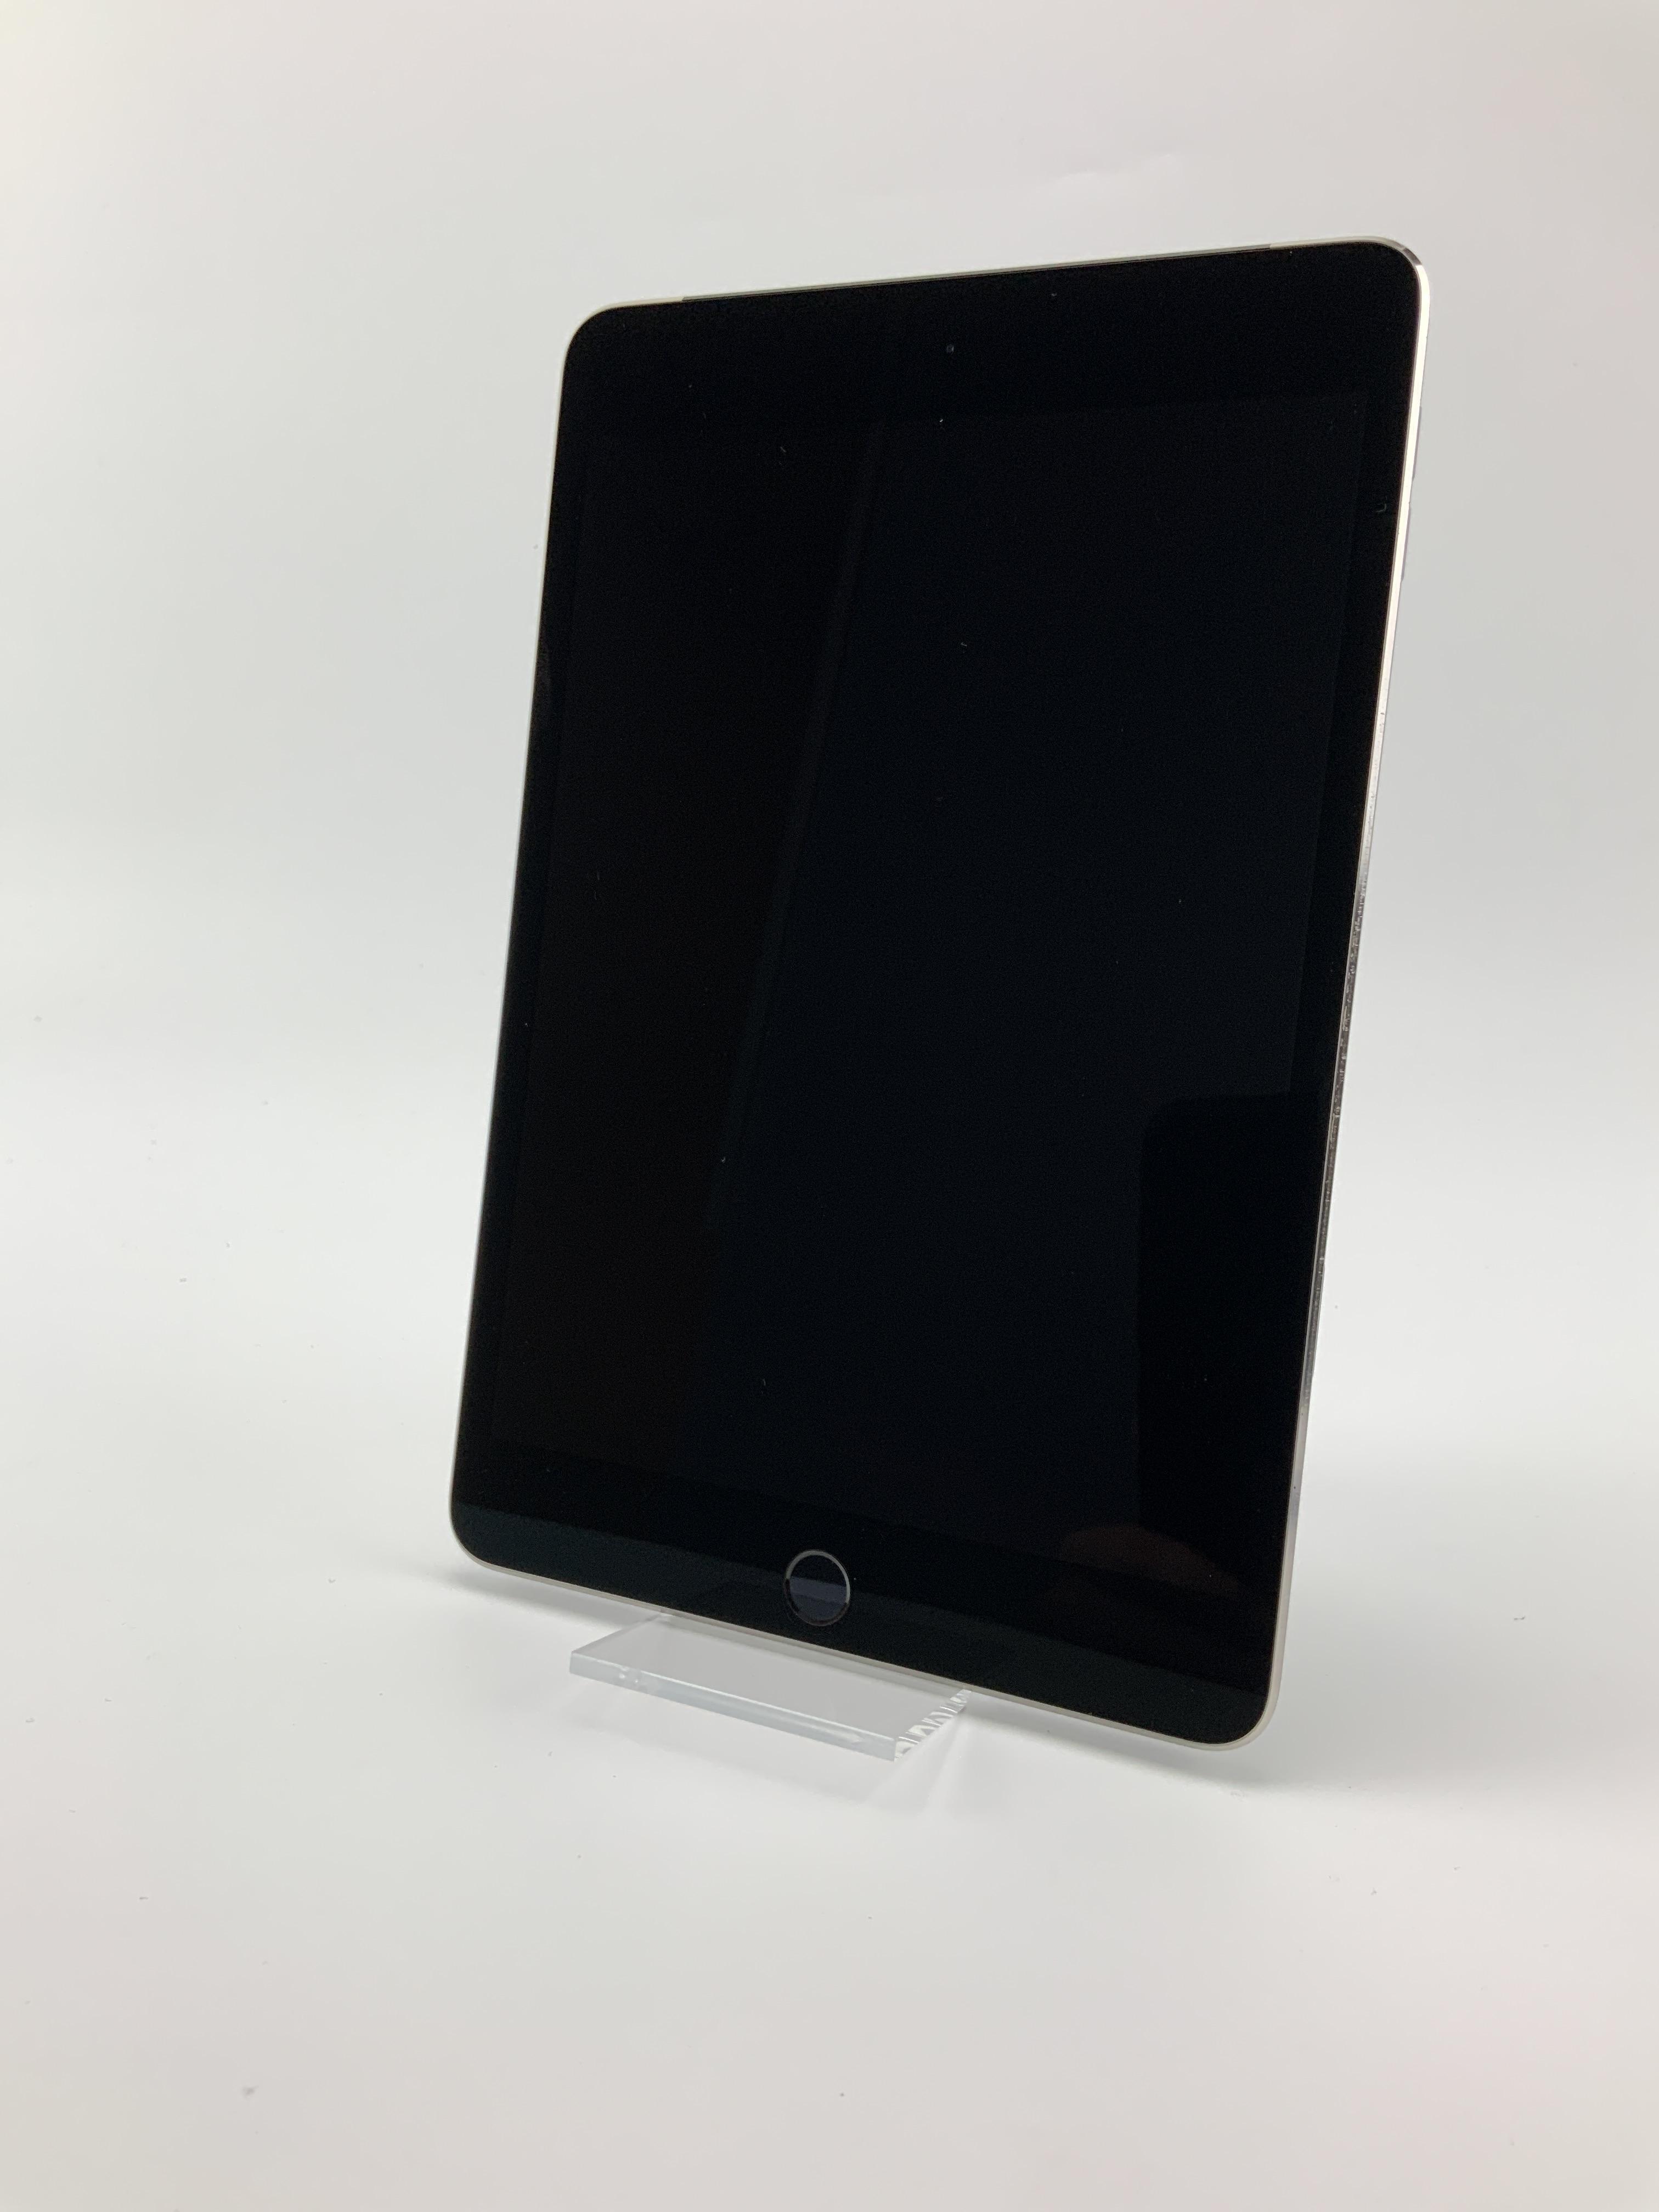 iPad mini 4 Wi-Fi + Cellular 64GB, 64GB, Space Gray, imagen 1